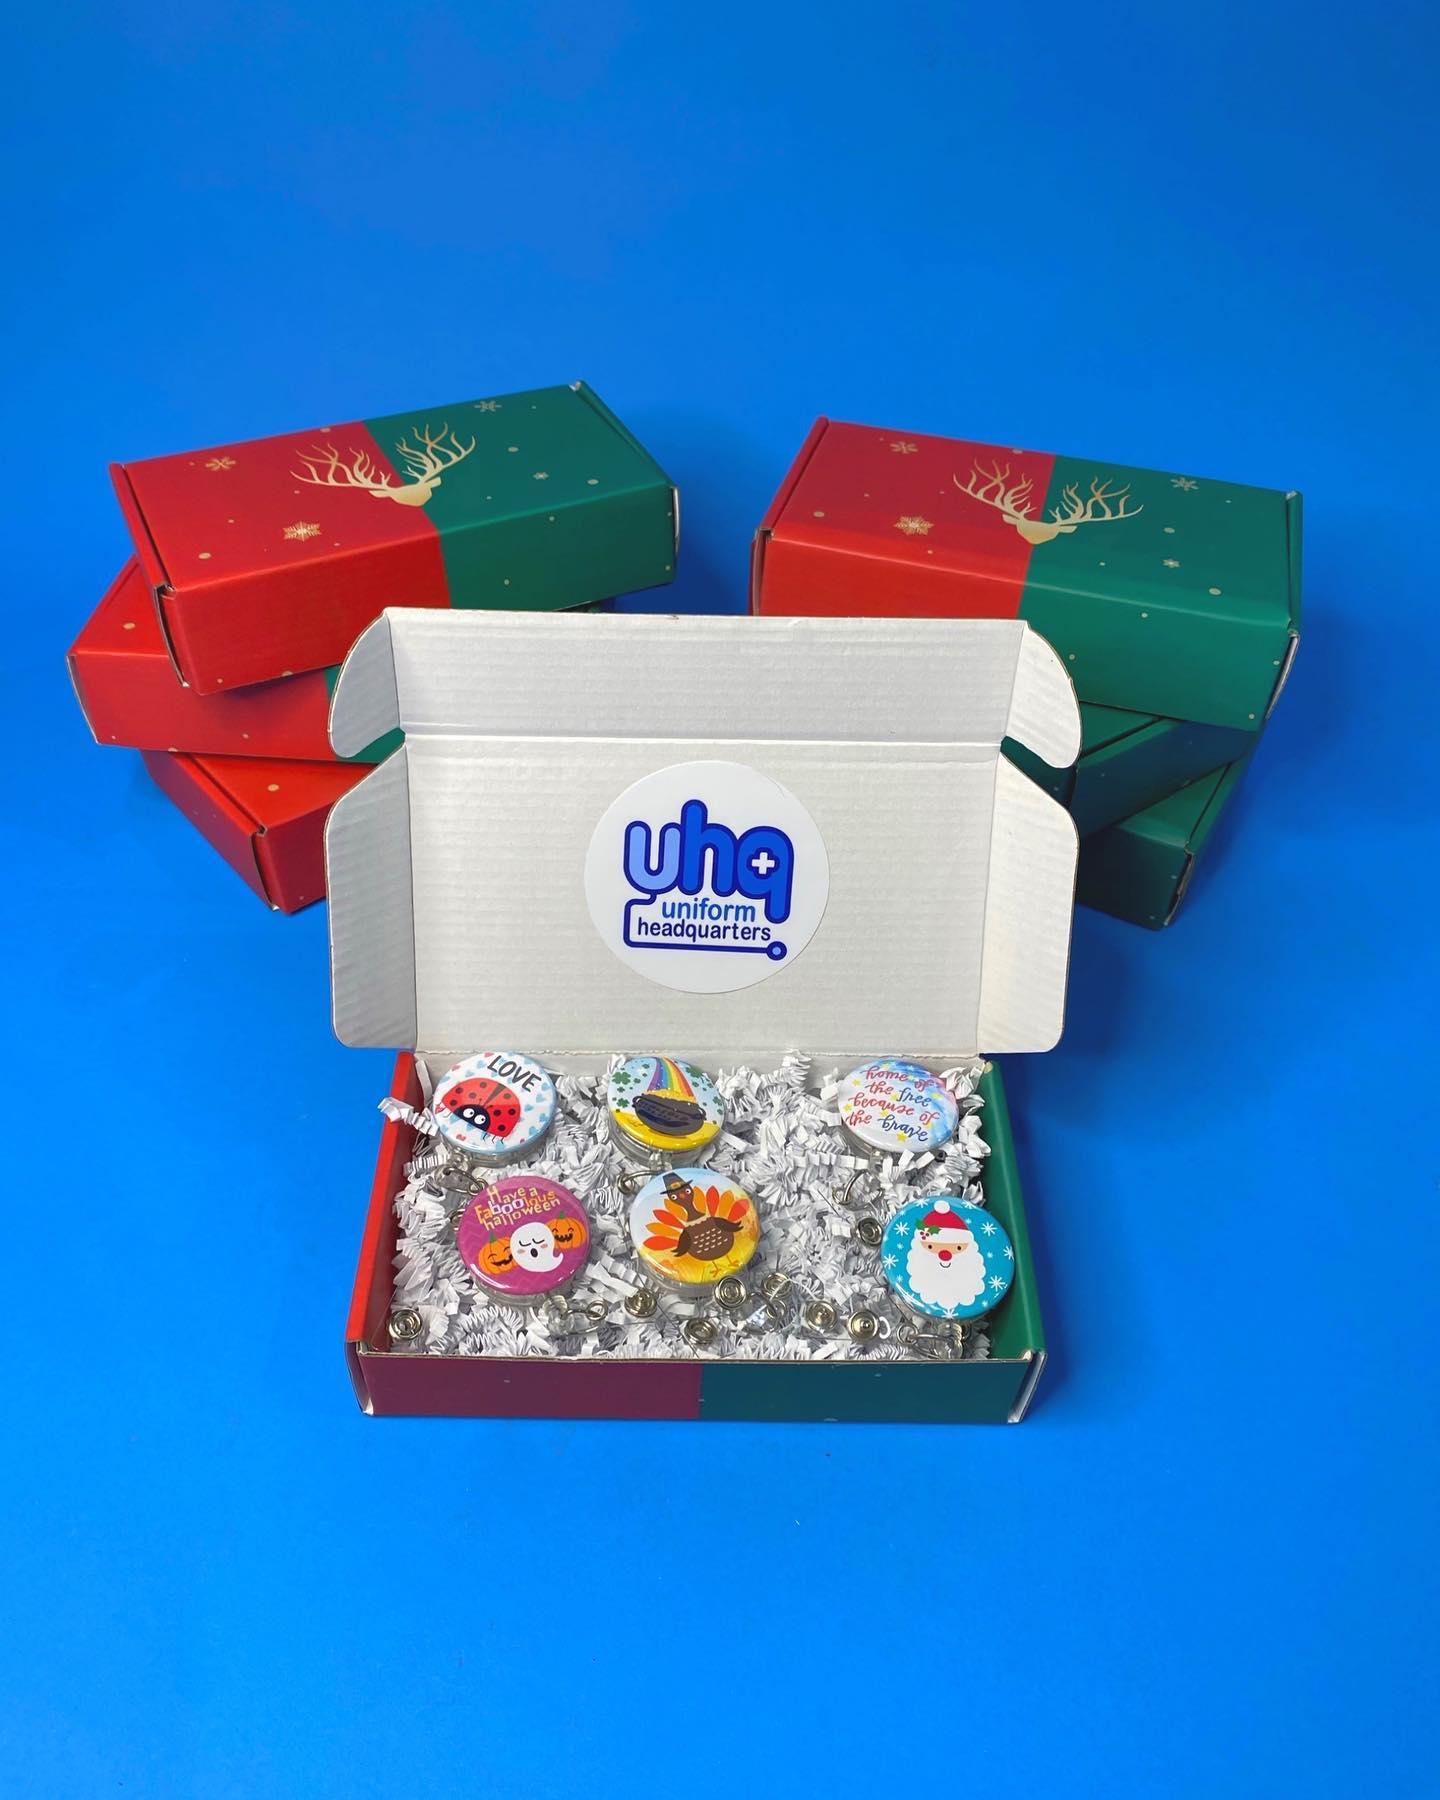 Holiday Badge Reel Gift Set-Uniform Headquarters